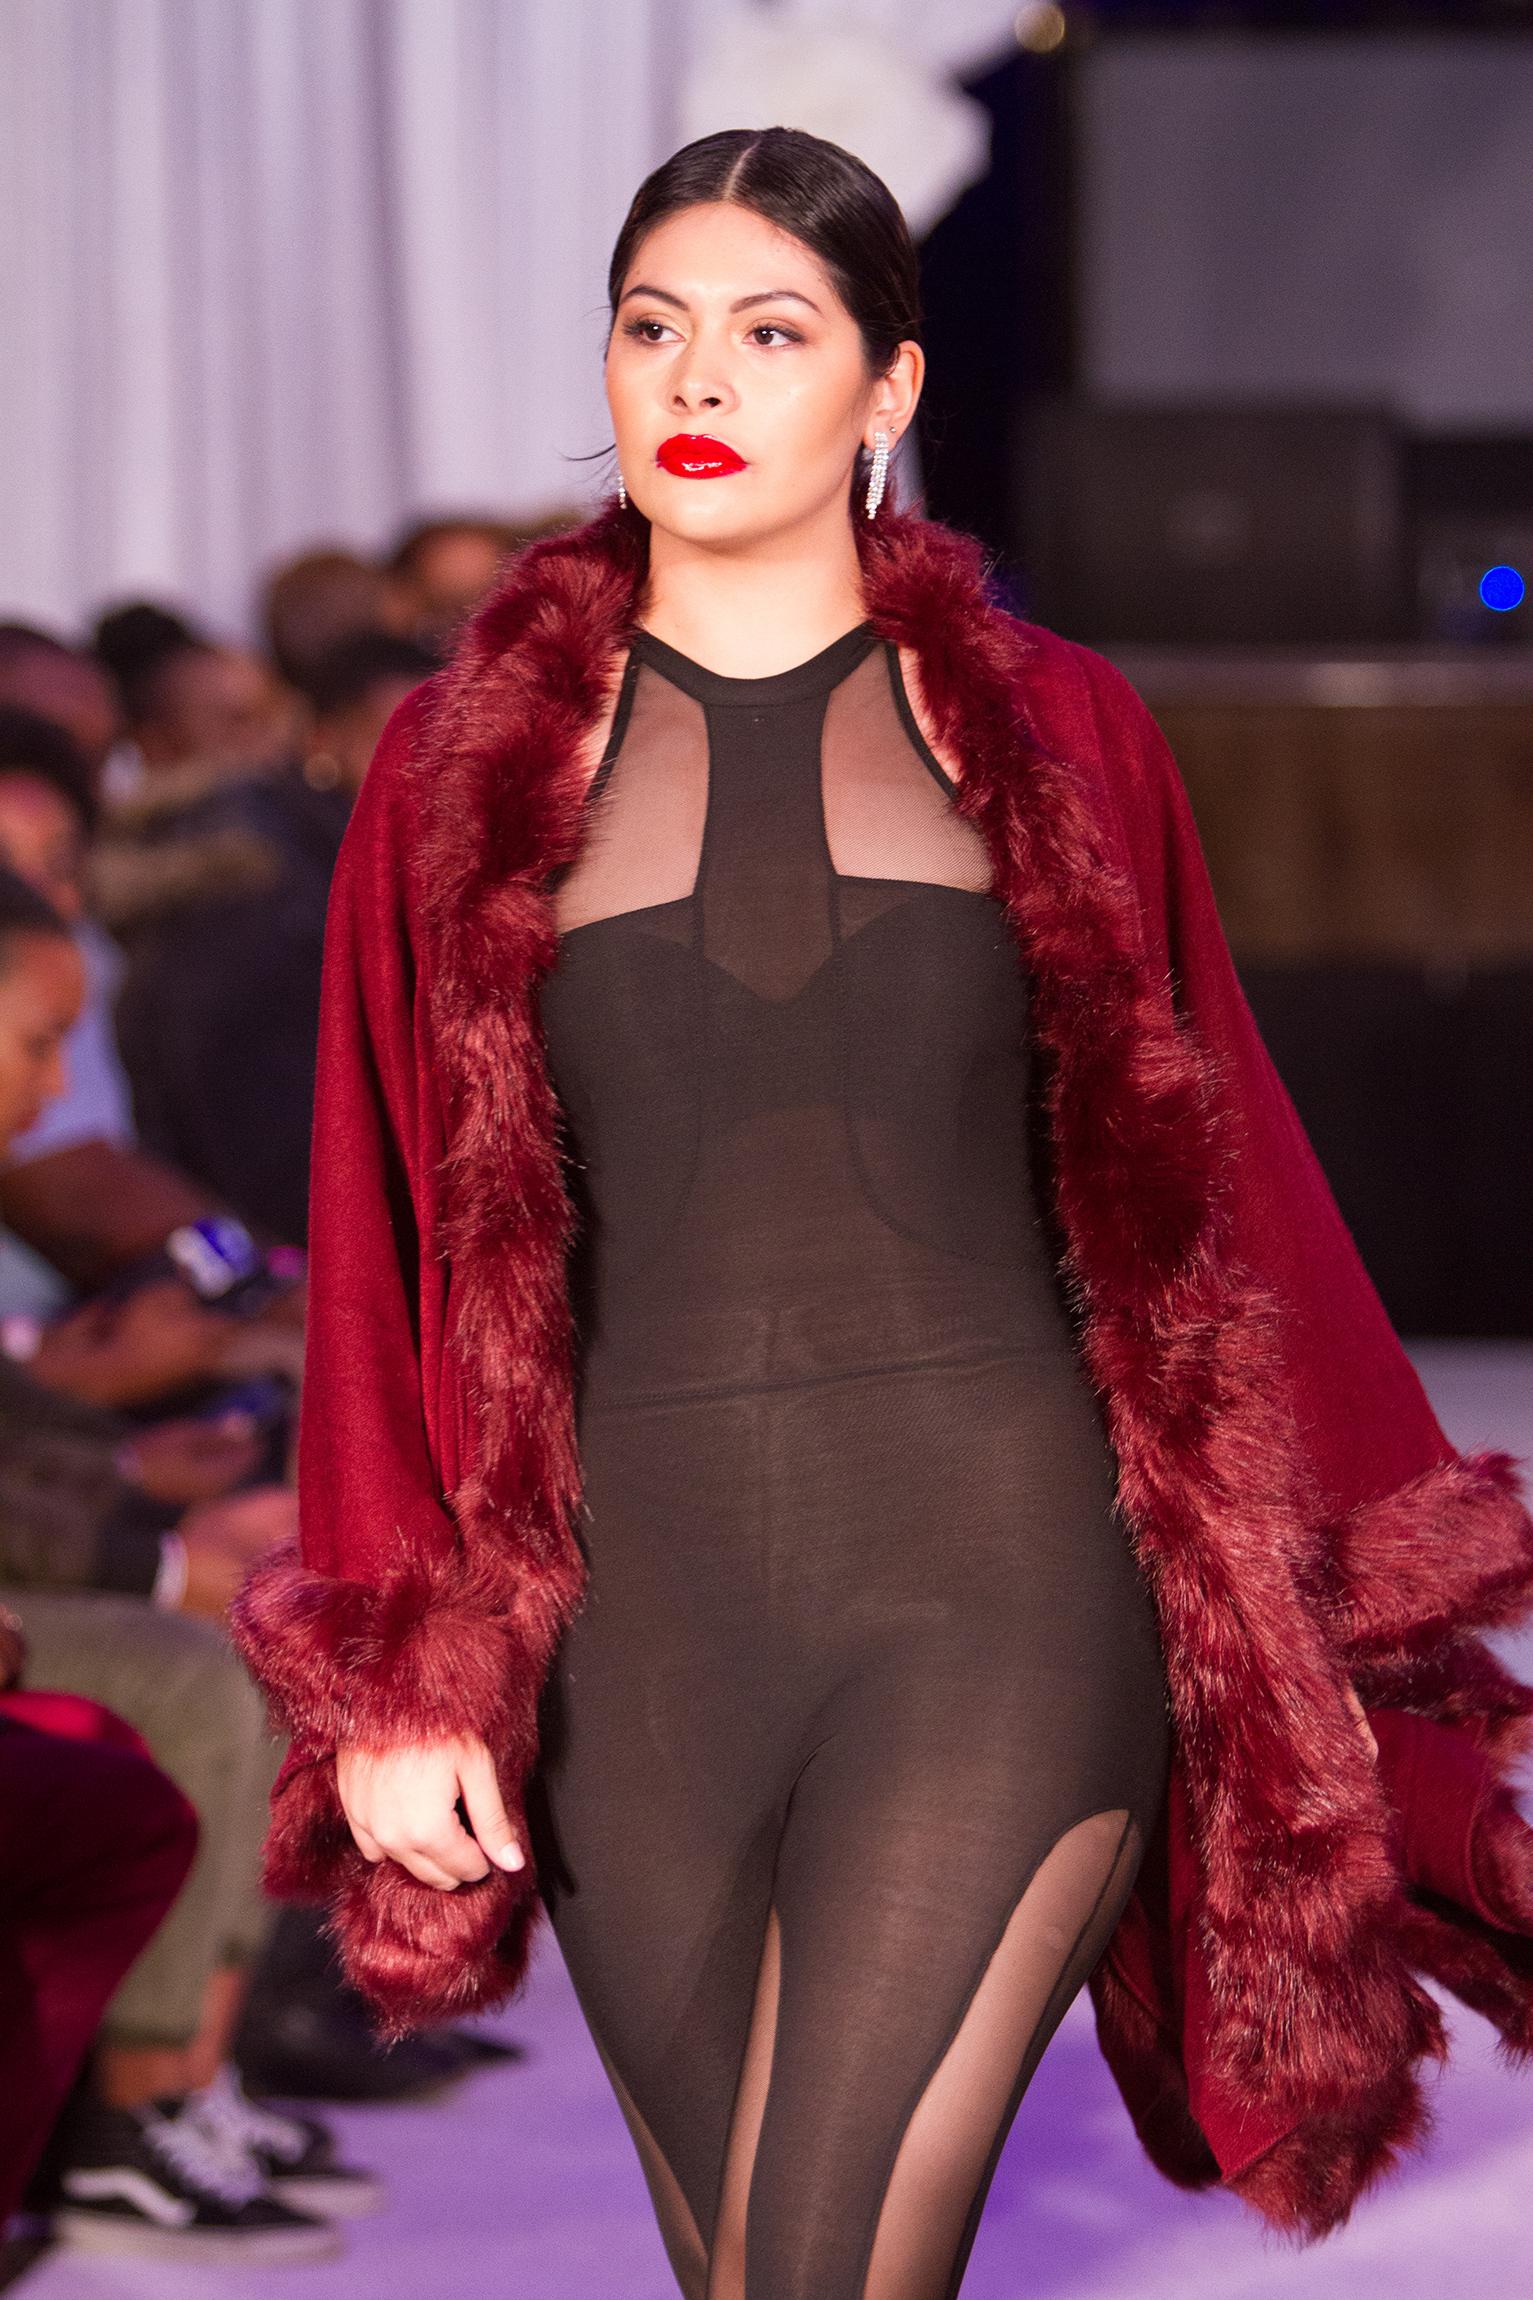 Lady MV Royal Rose Winter Fashion Show